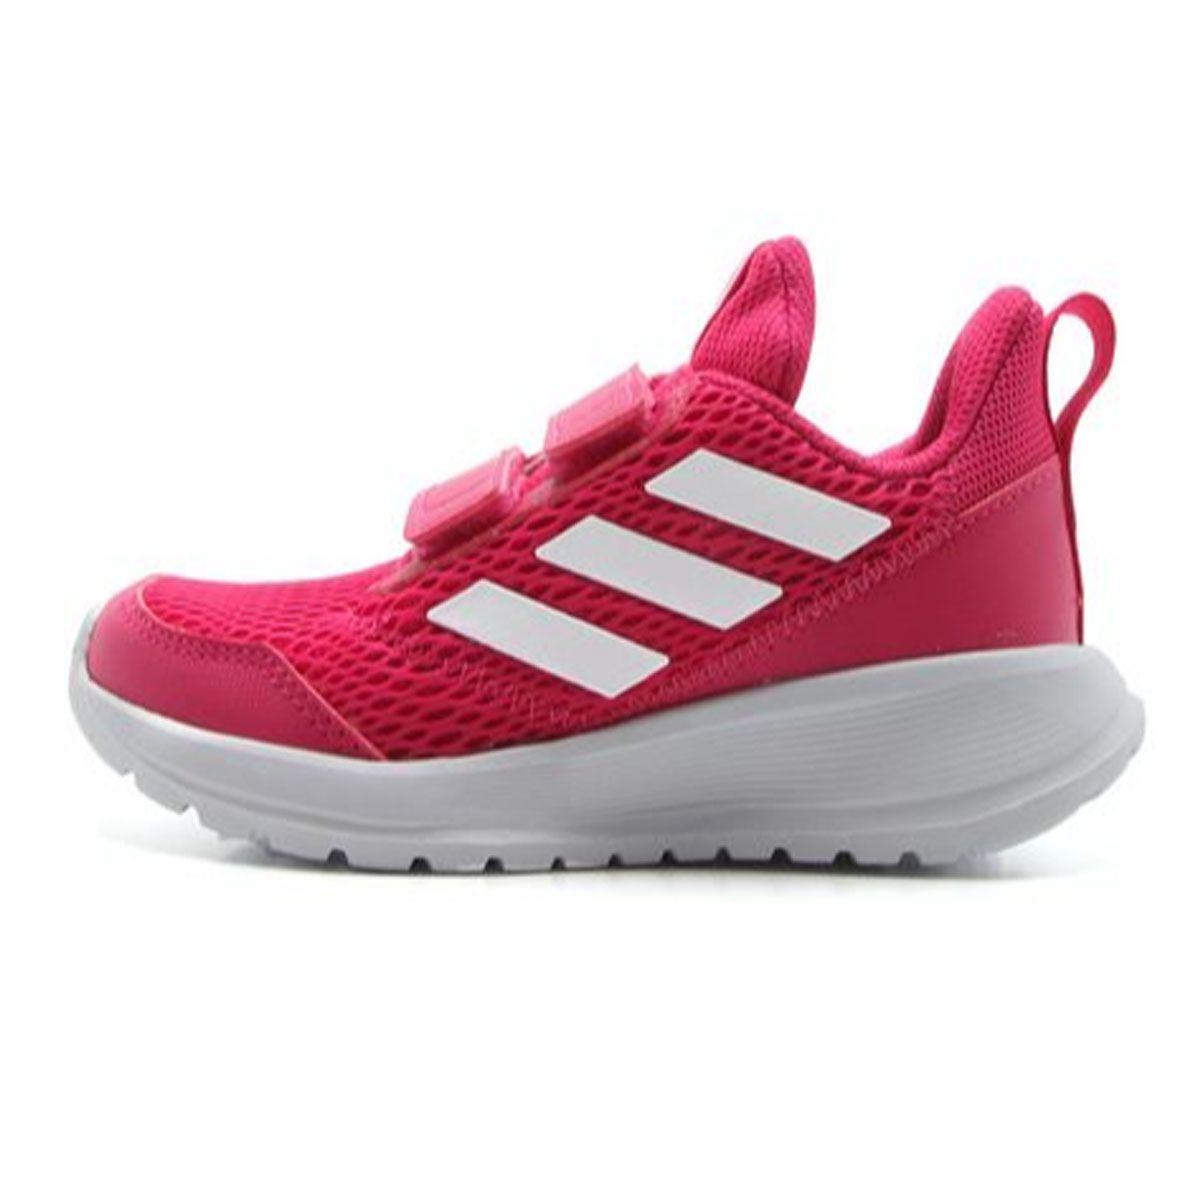 Tênis Adidas AltaRun CF K Infantil